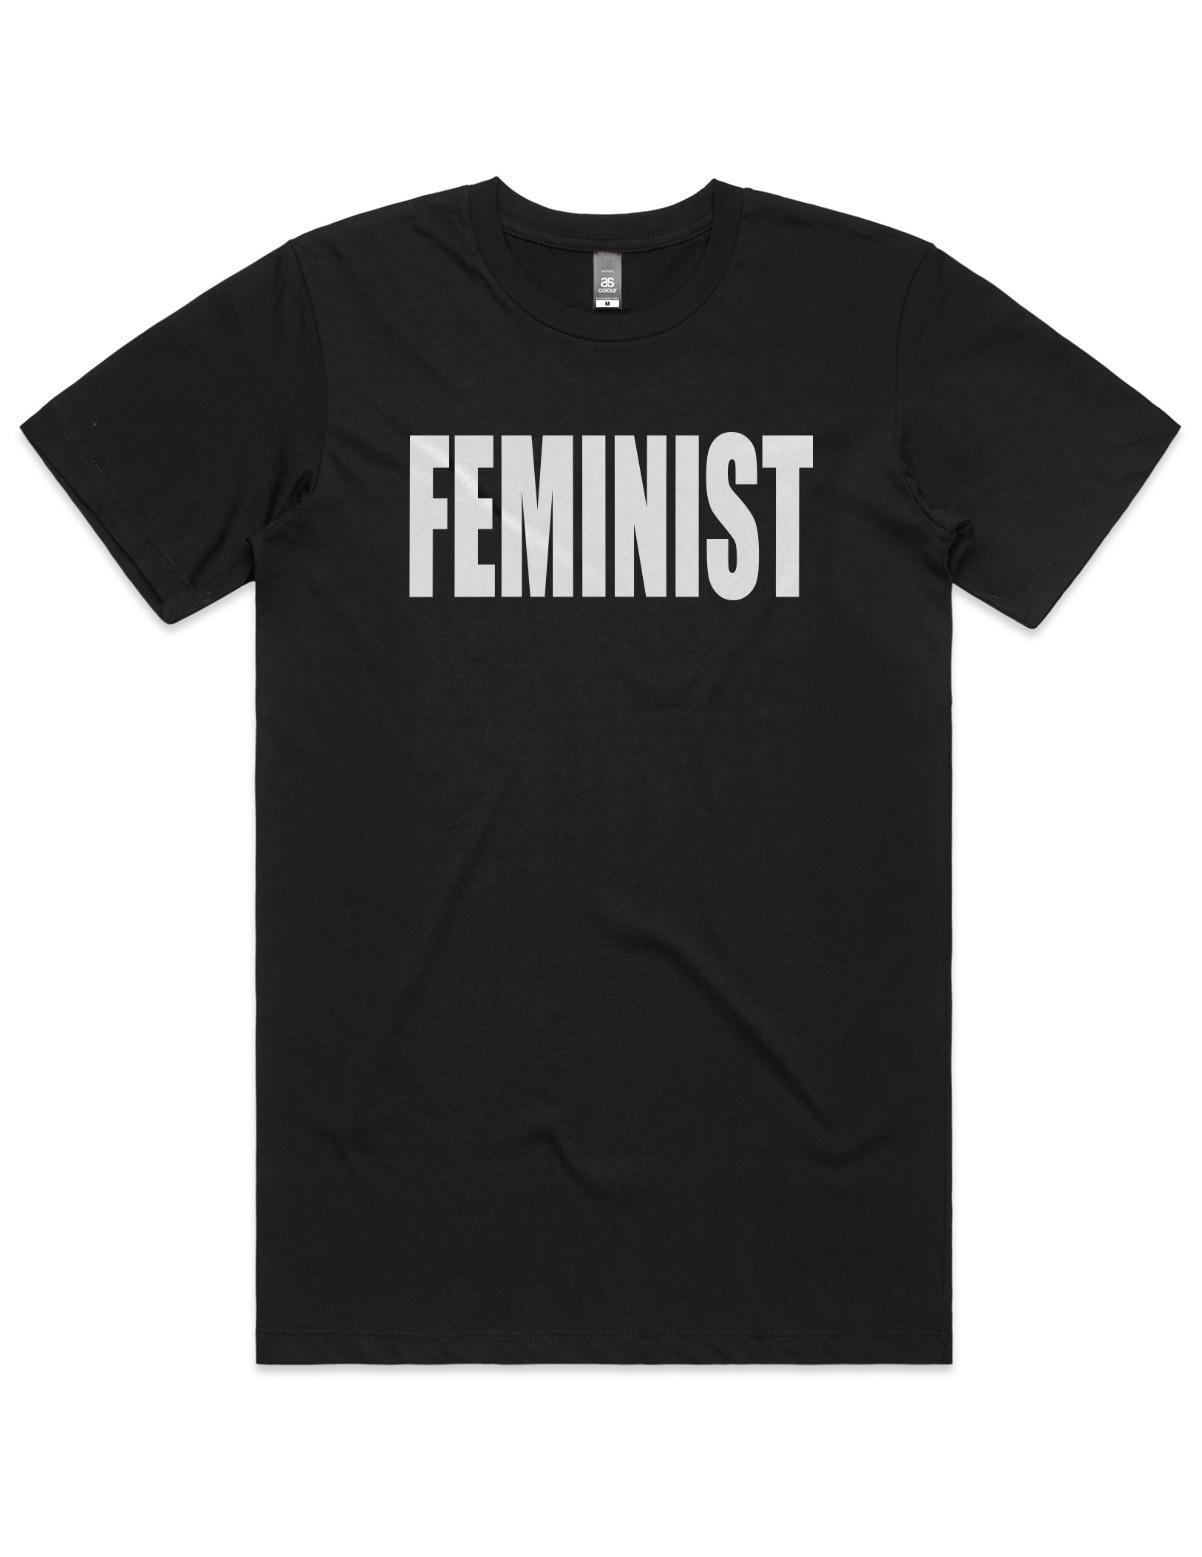 Feminist T-Shirt Black(Large,Unisex)